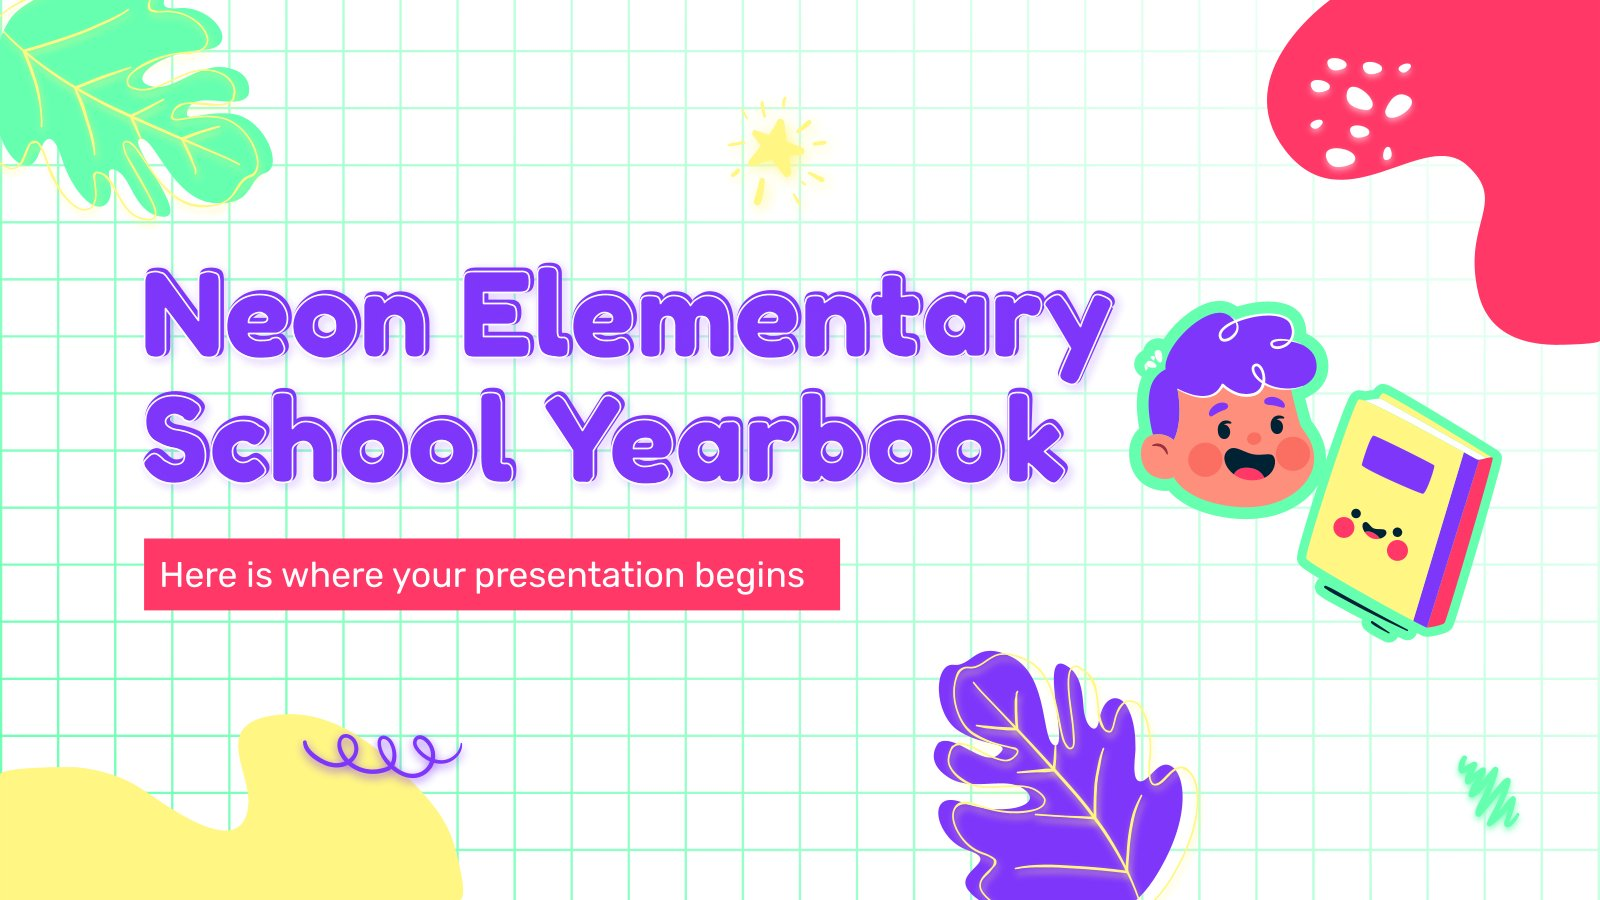 Plantilla de presentación Anuario escolar de primaria con efecto neón